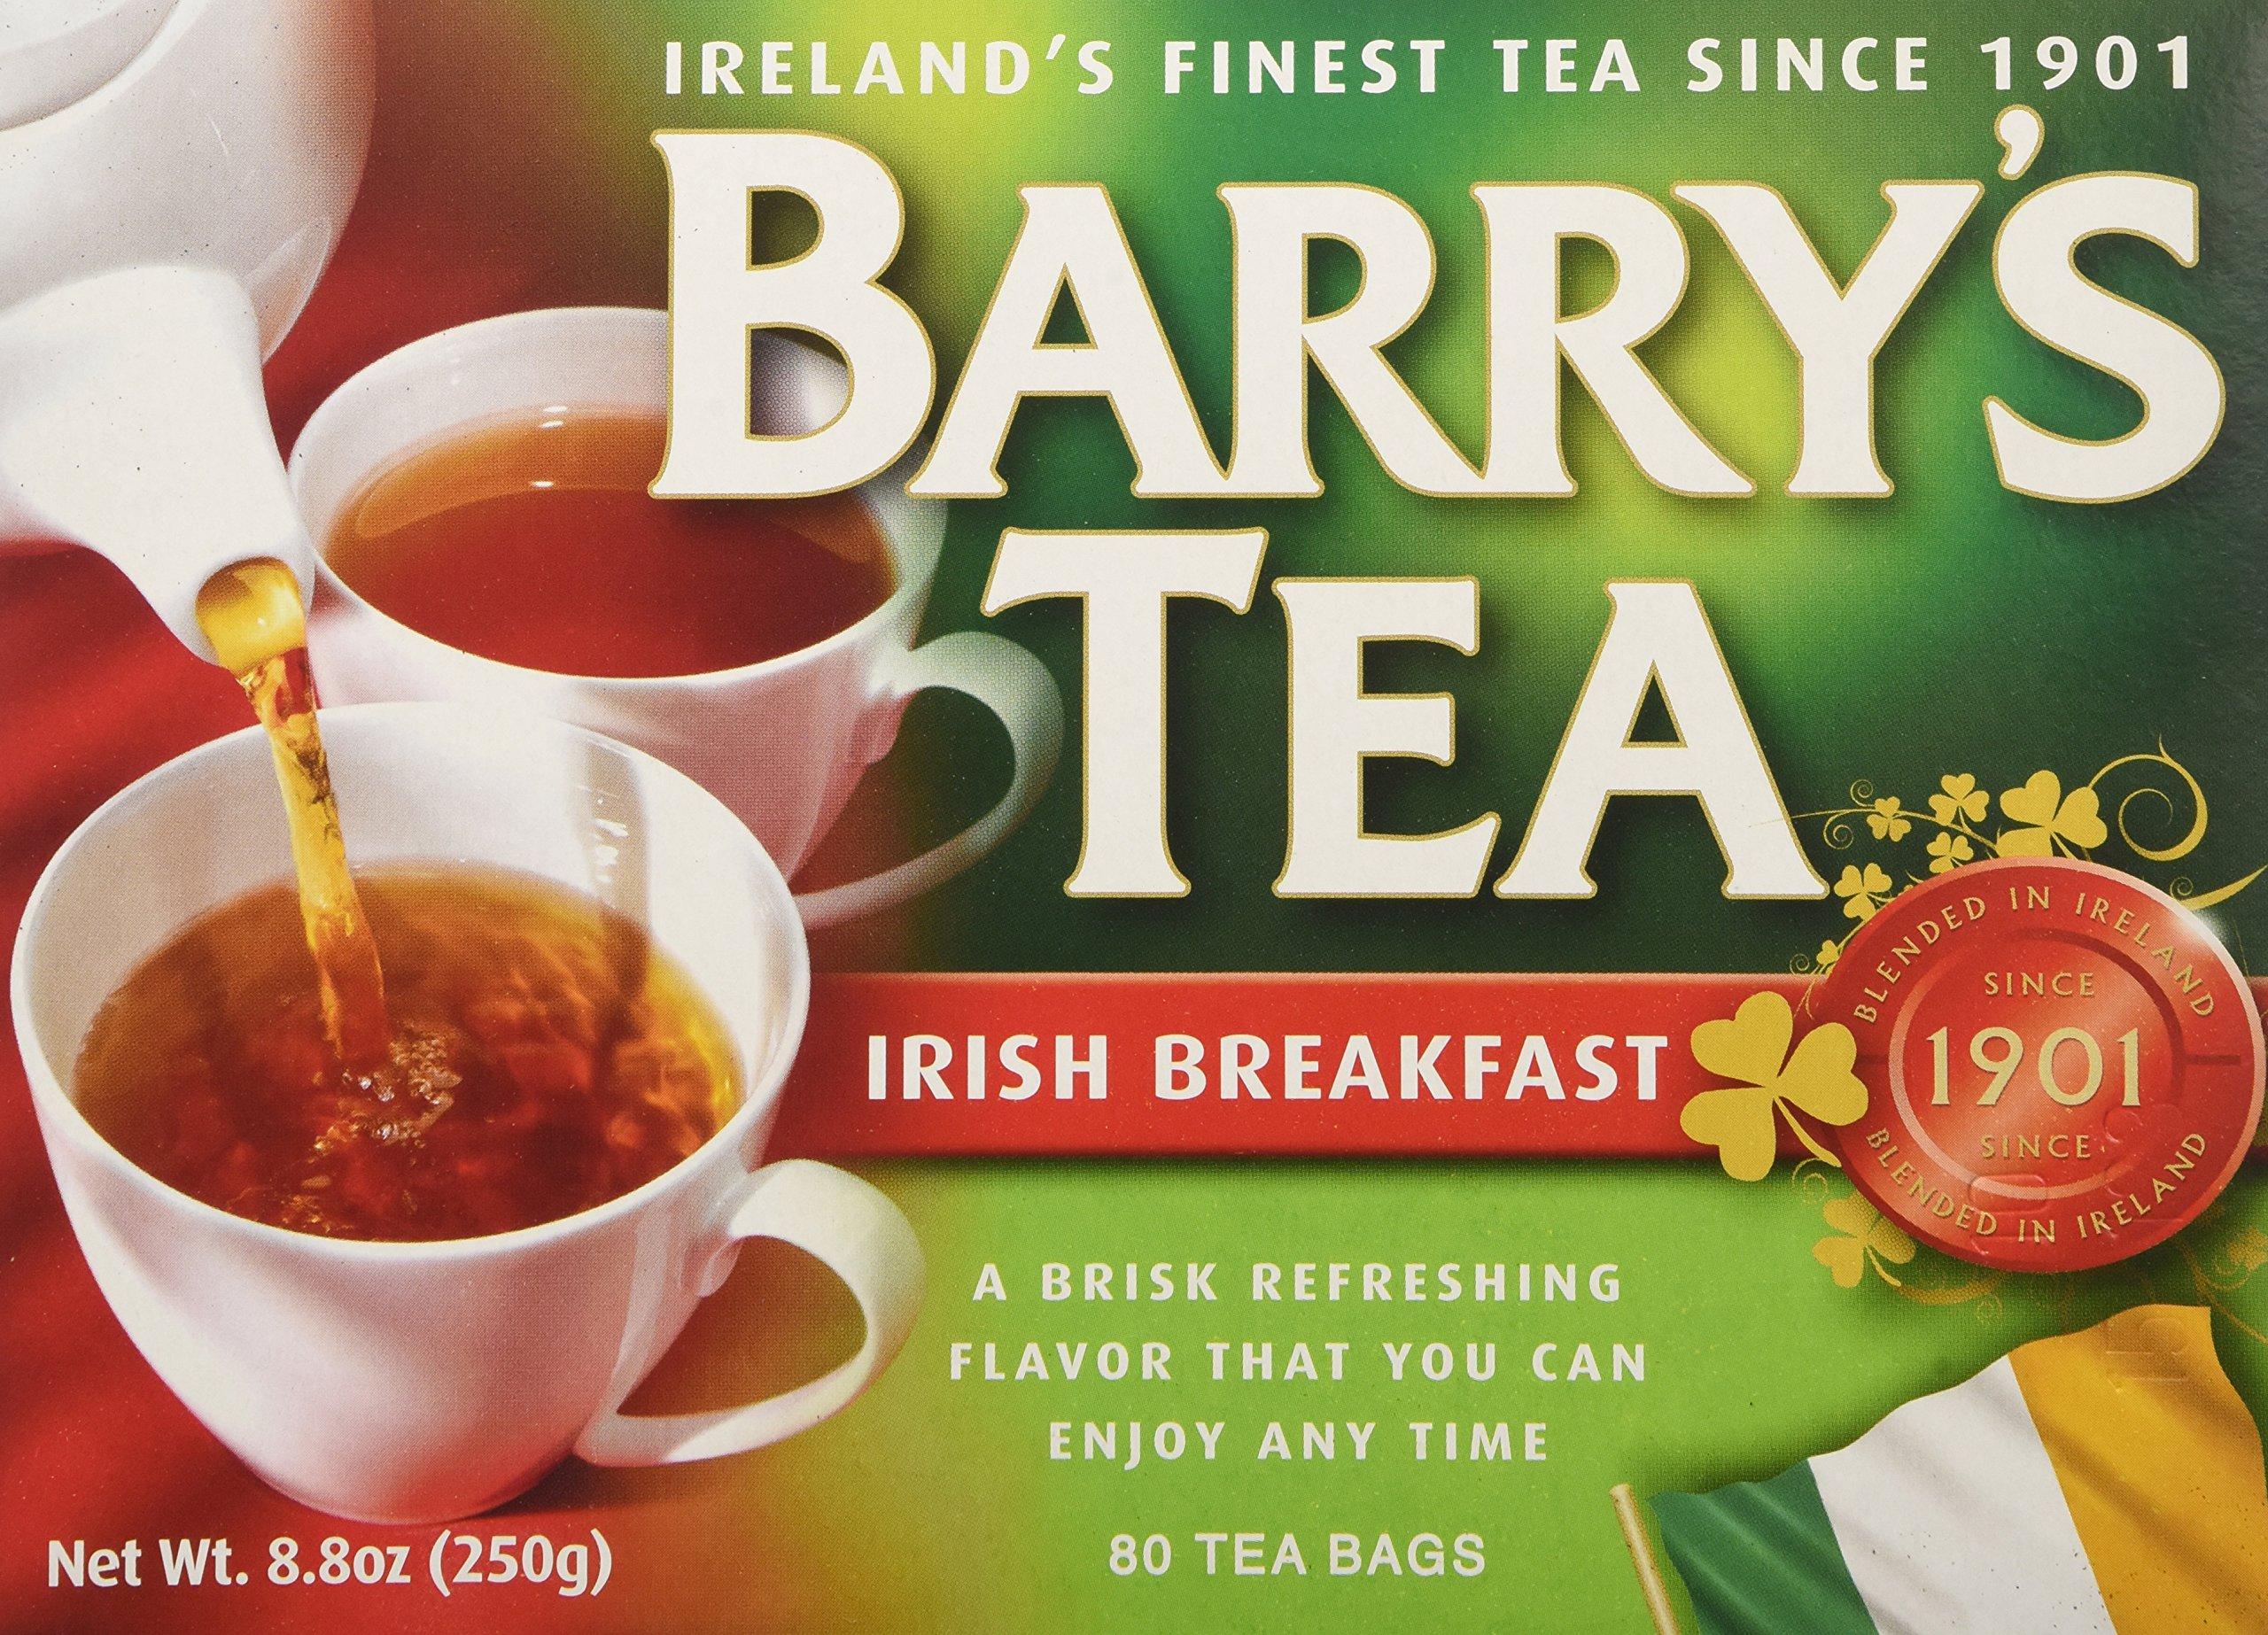 Barry's Tea Irish Breakfast Teabags (80) - Pack of 2 by Barry's Tea